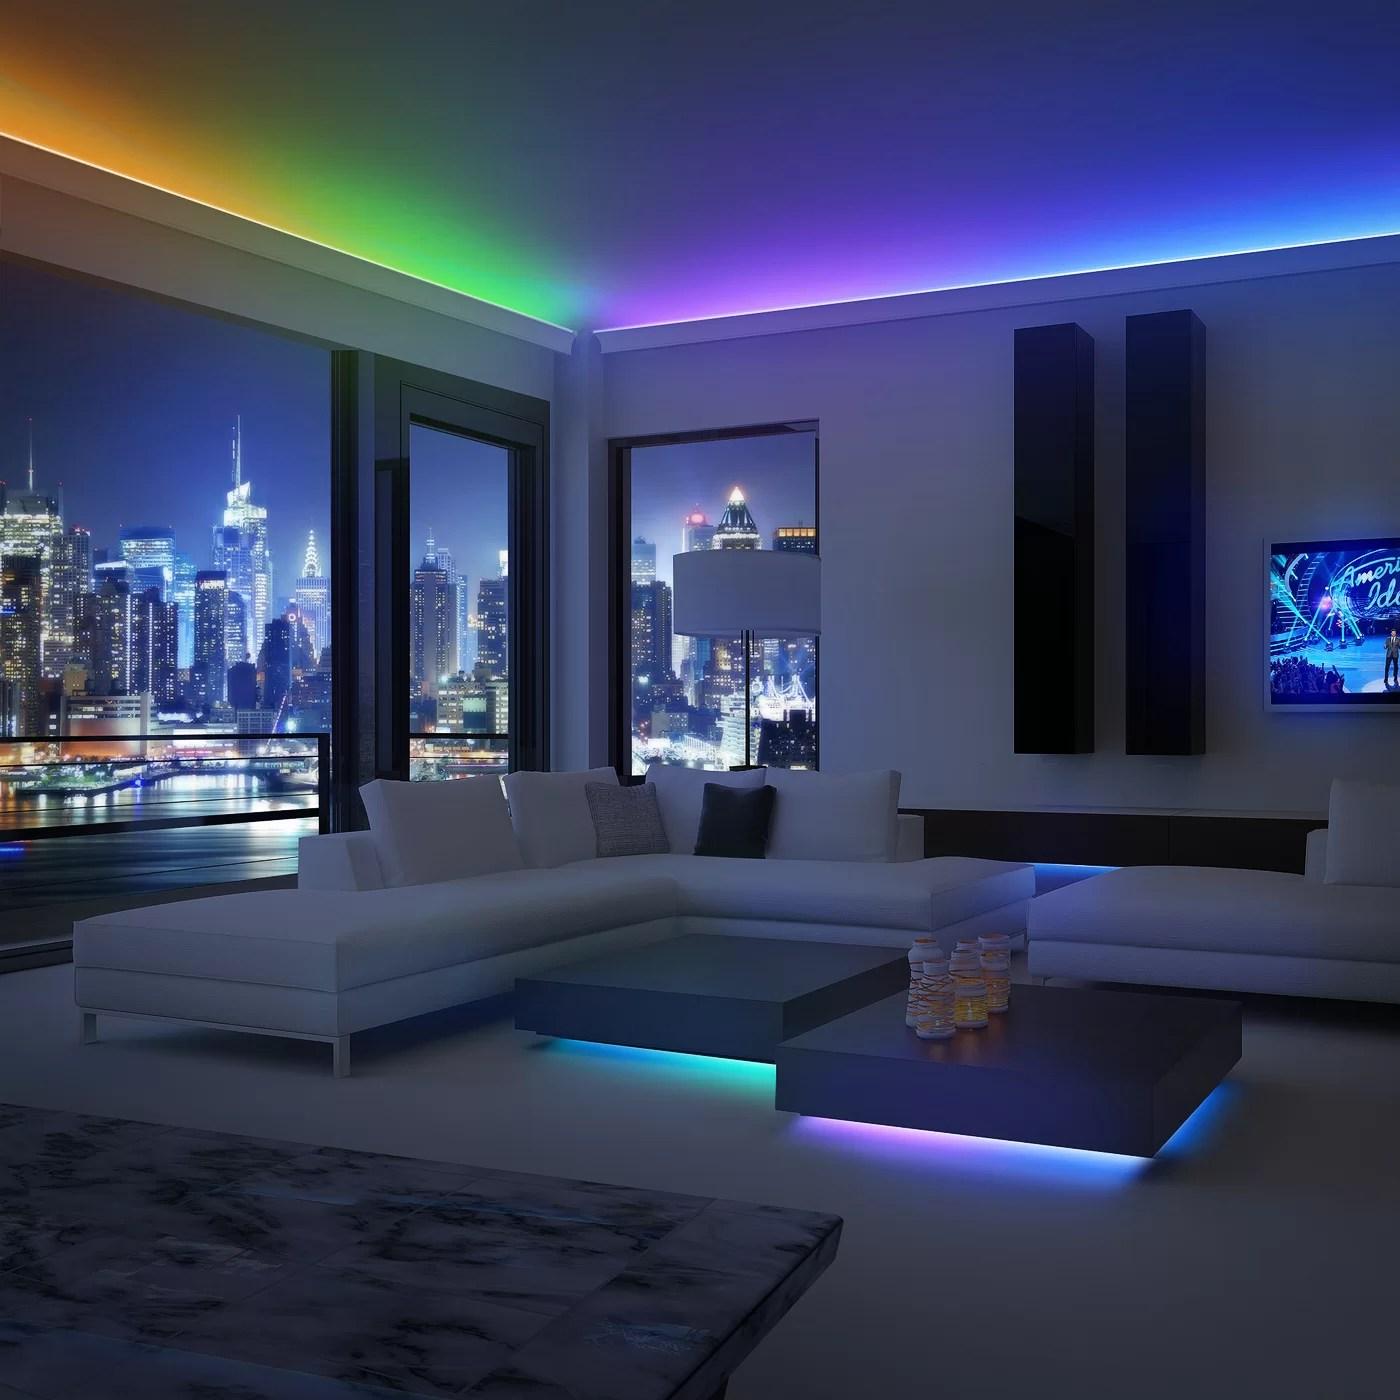 under cabinet lighting c kitchen cabinet lights QUICK VIEW Music LED Under Cabinet Strip Light